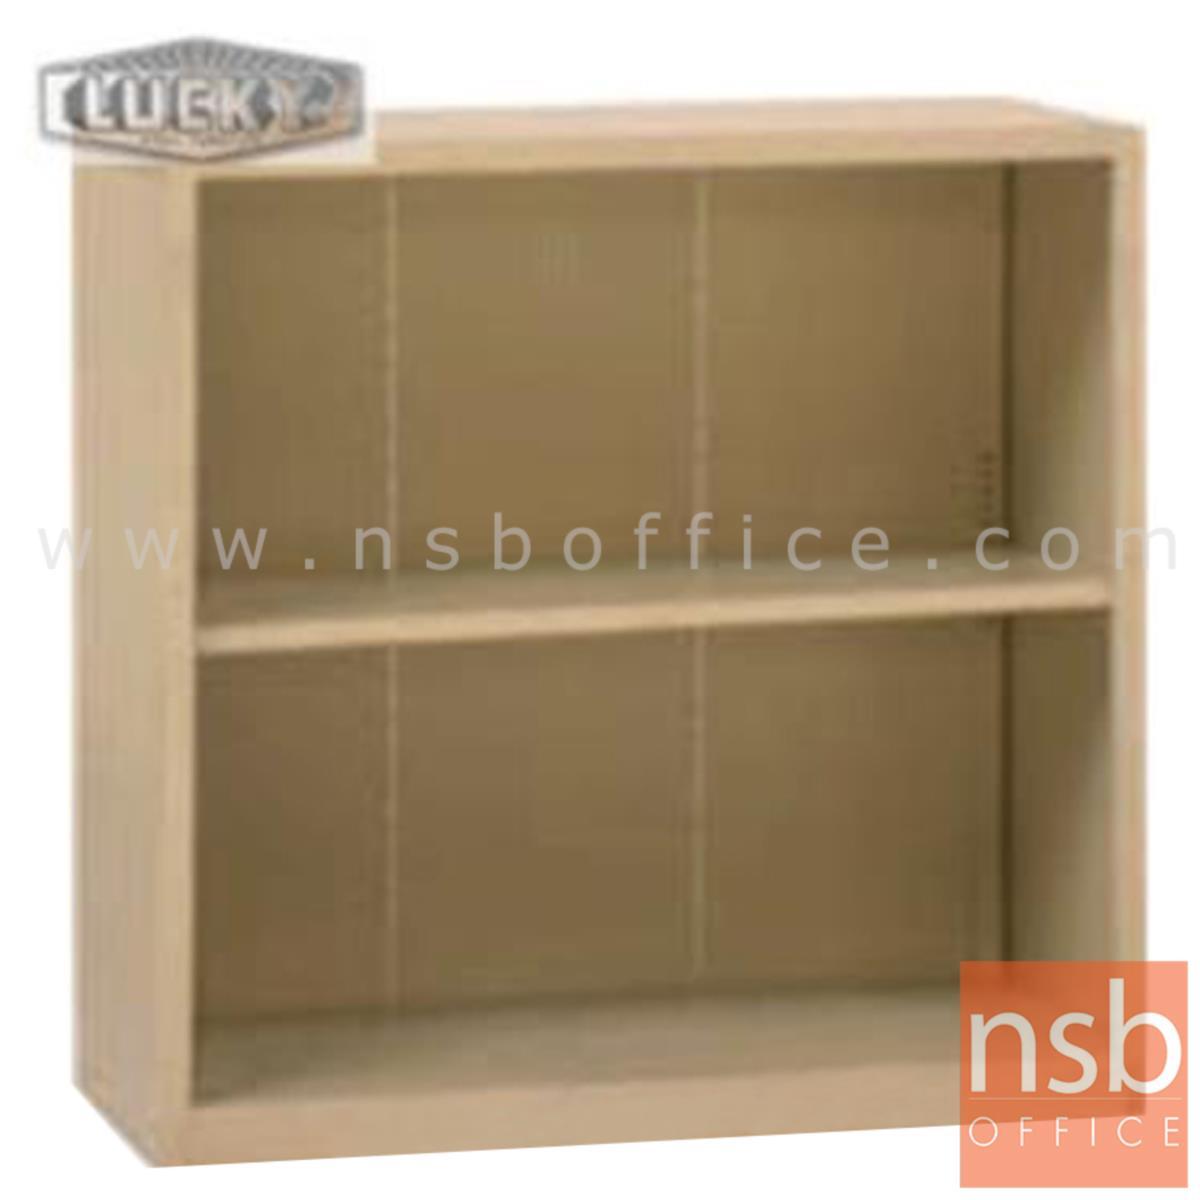 E28A030:ตู้วางหนังสือ 2 ช่องโล่ง 76.2W*32D*76.2H cm. รุ่น LUCKY-SB-3030